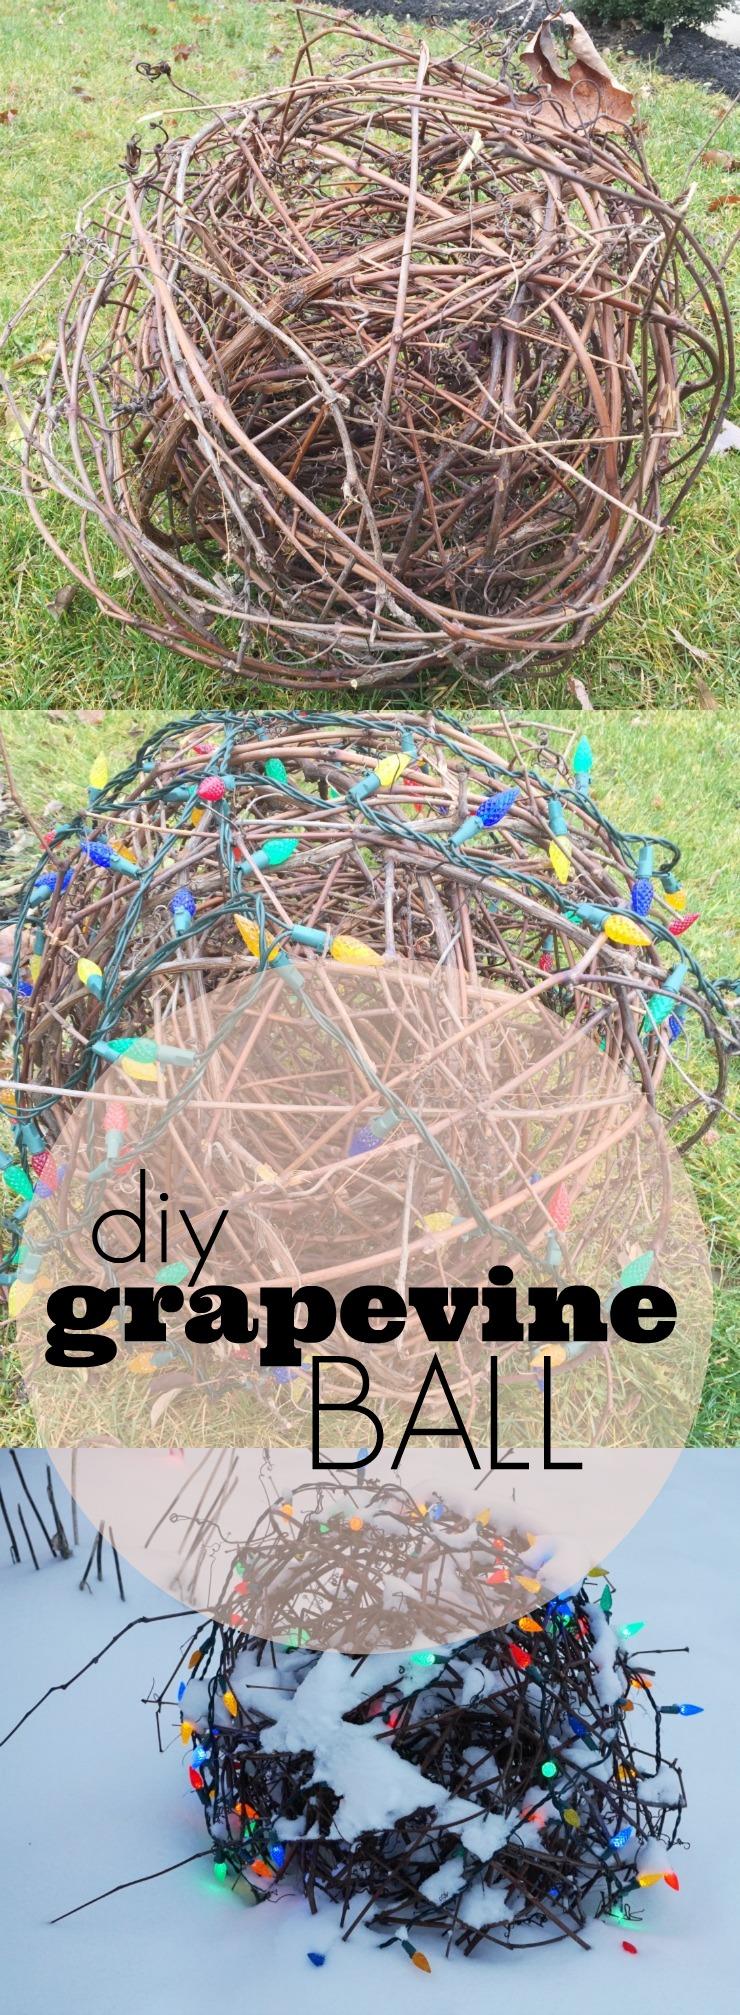 diy grapevine ball